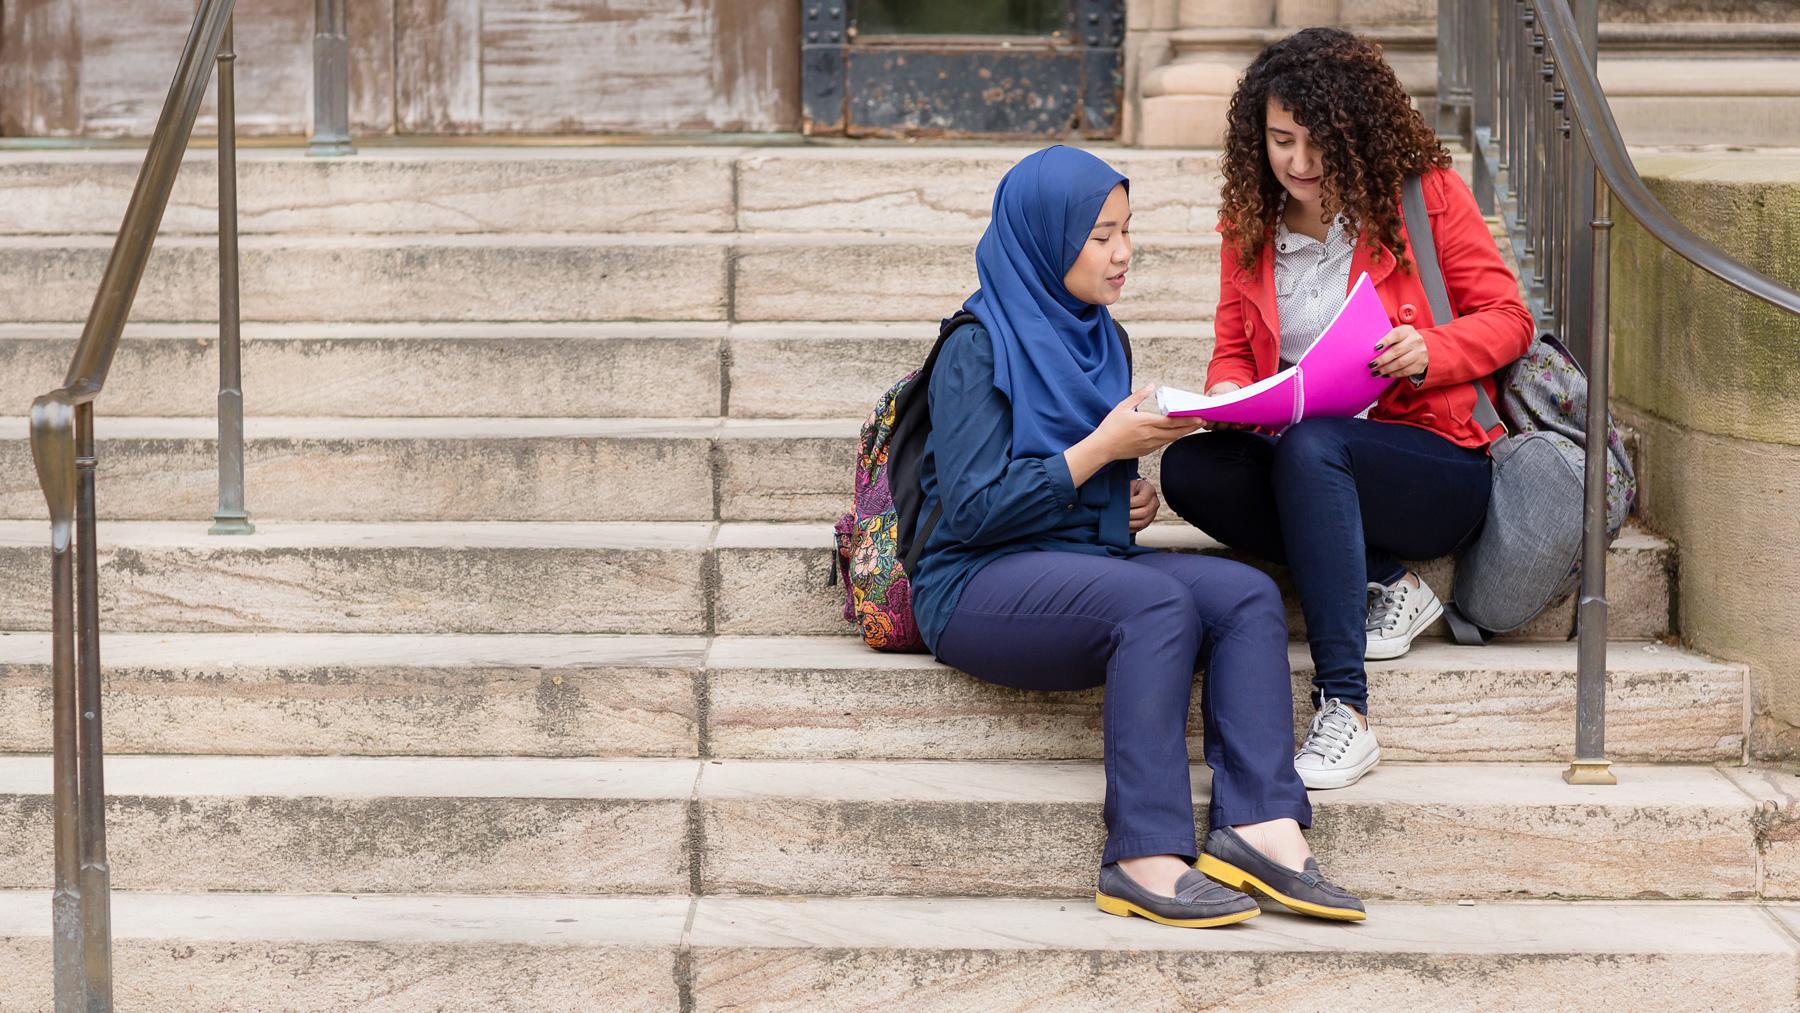 international students. Photo by L. Brian Stauffer